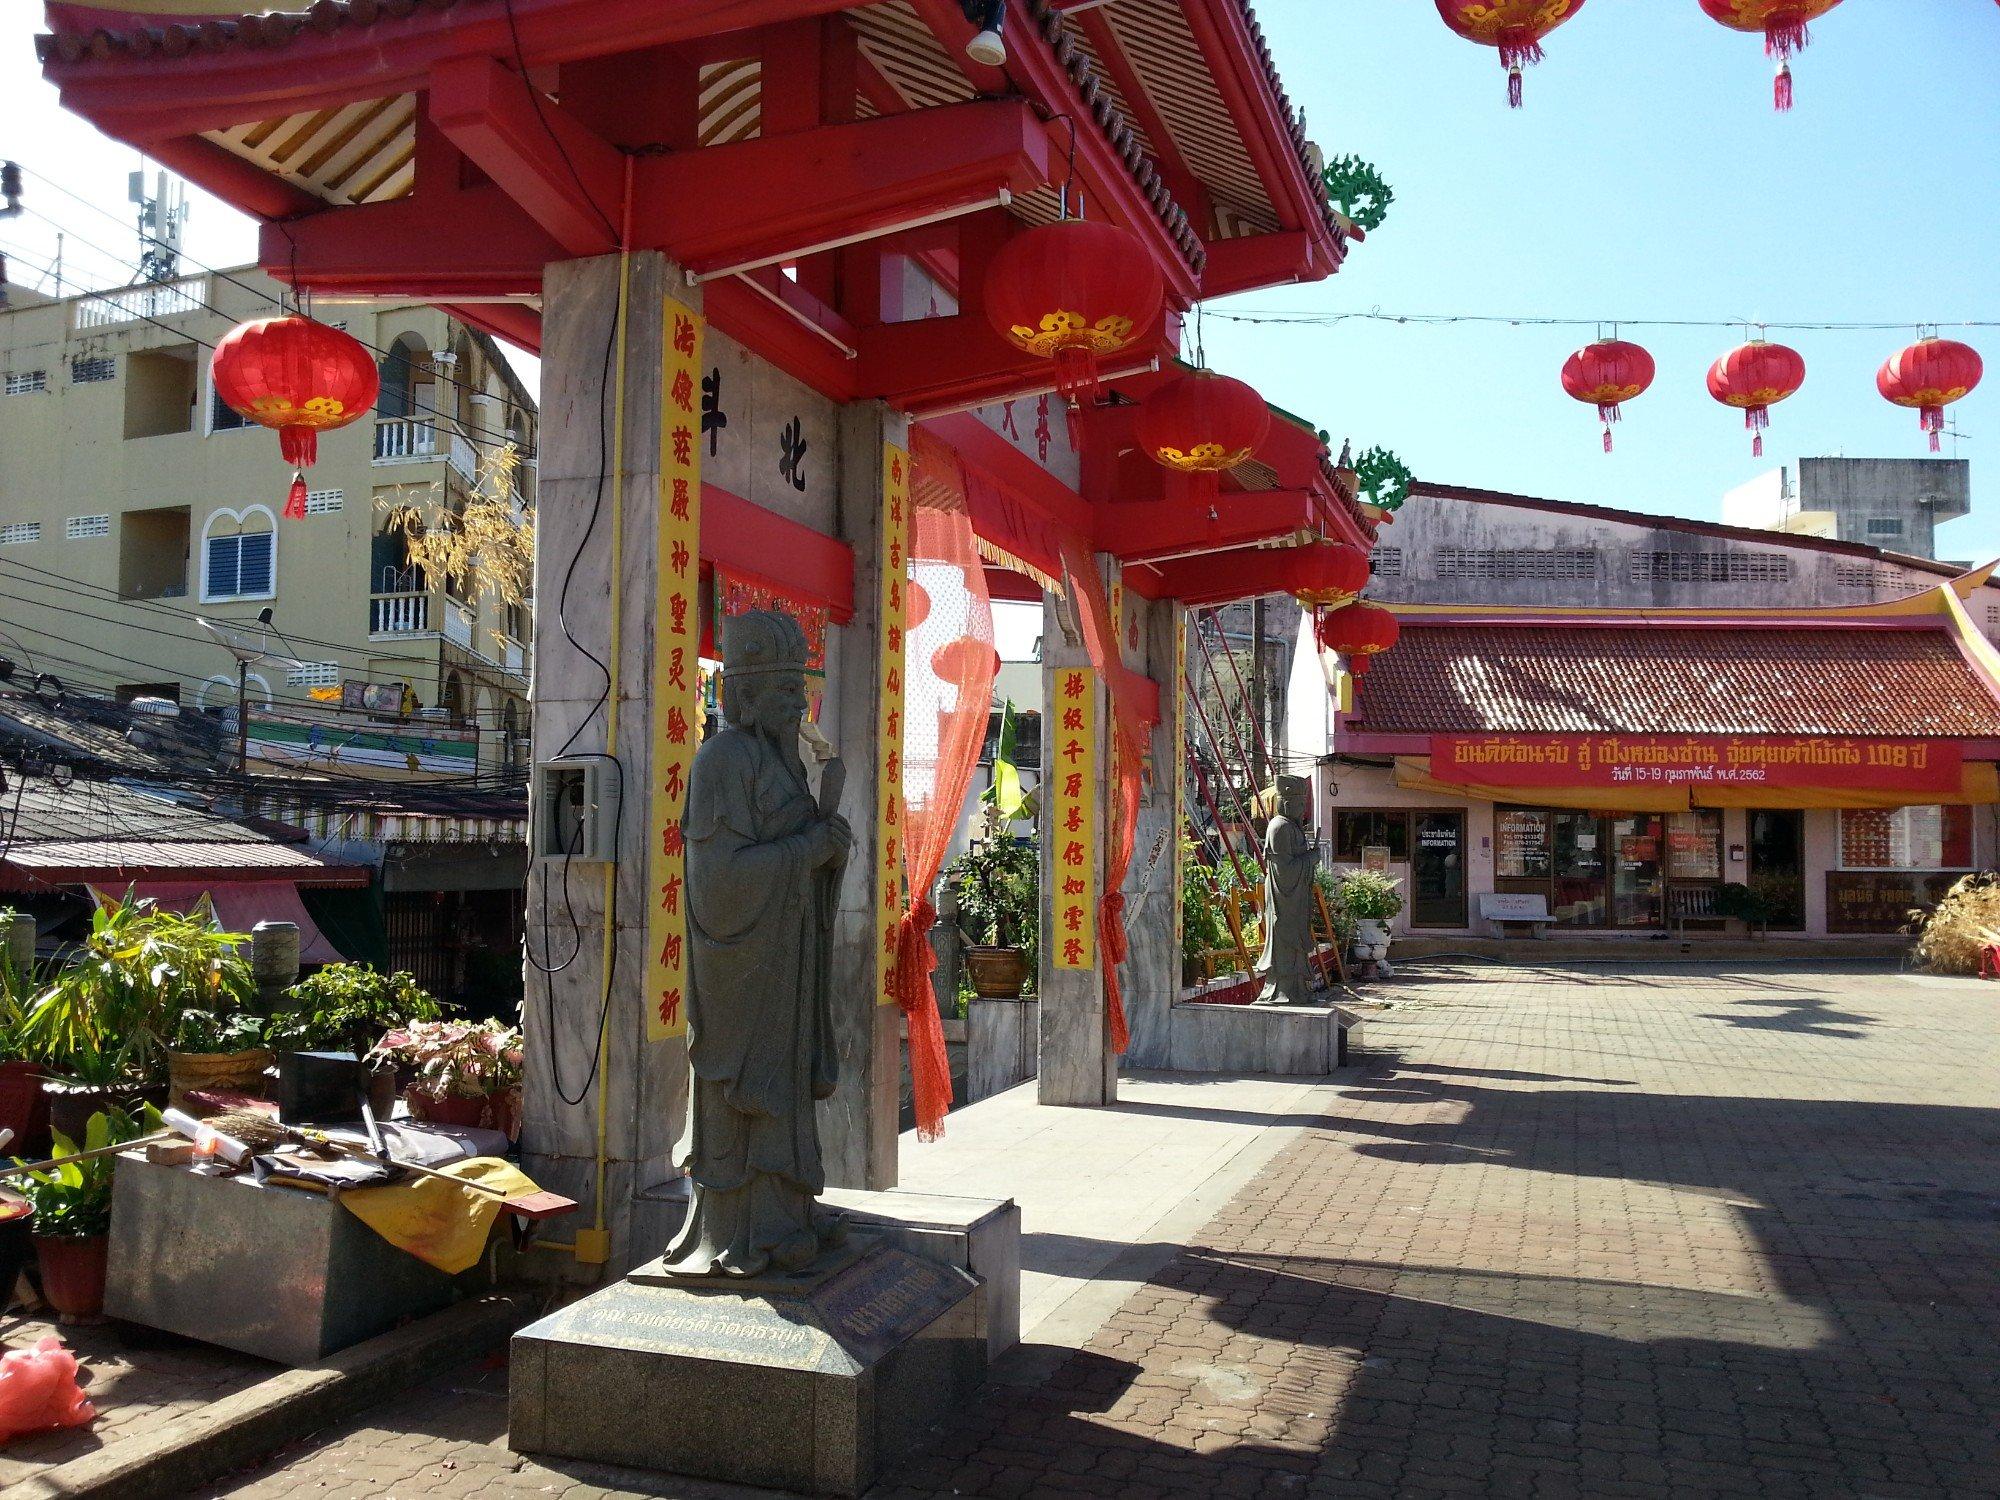 Courtyard of the Jui Tui Shrine